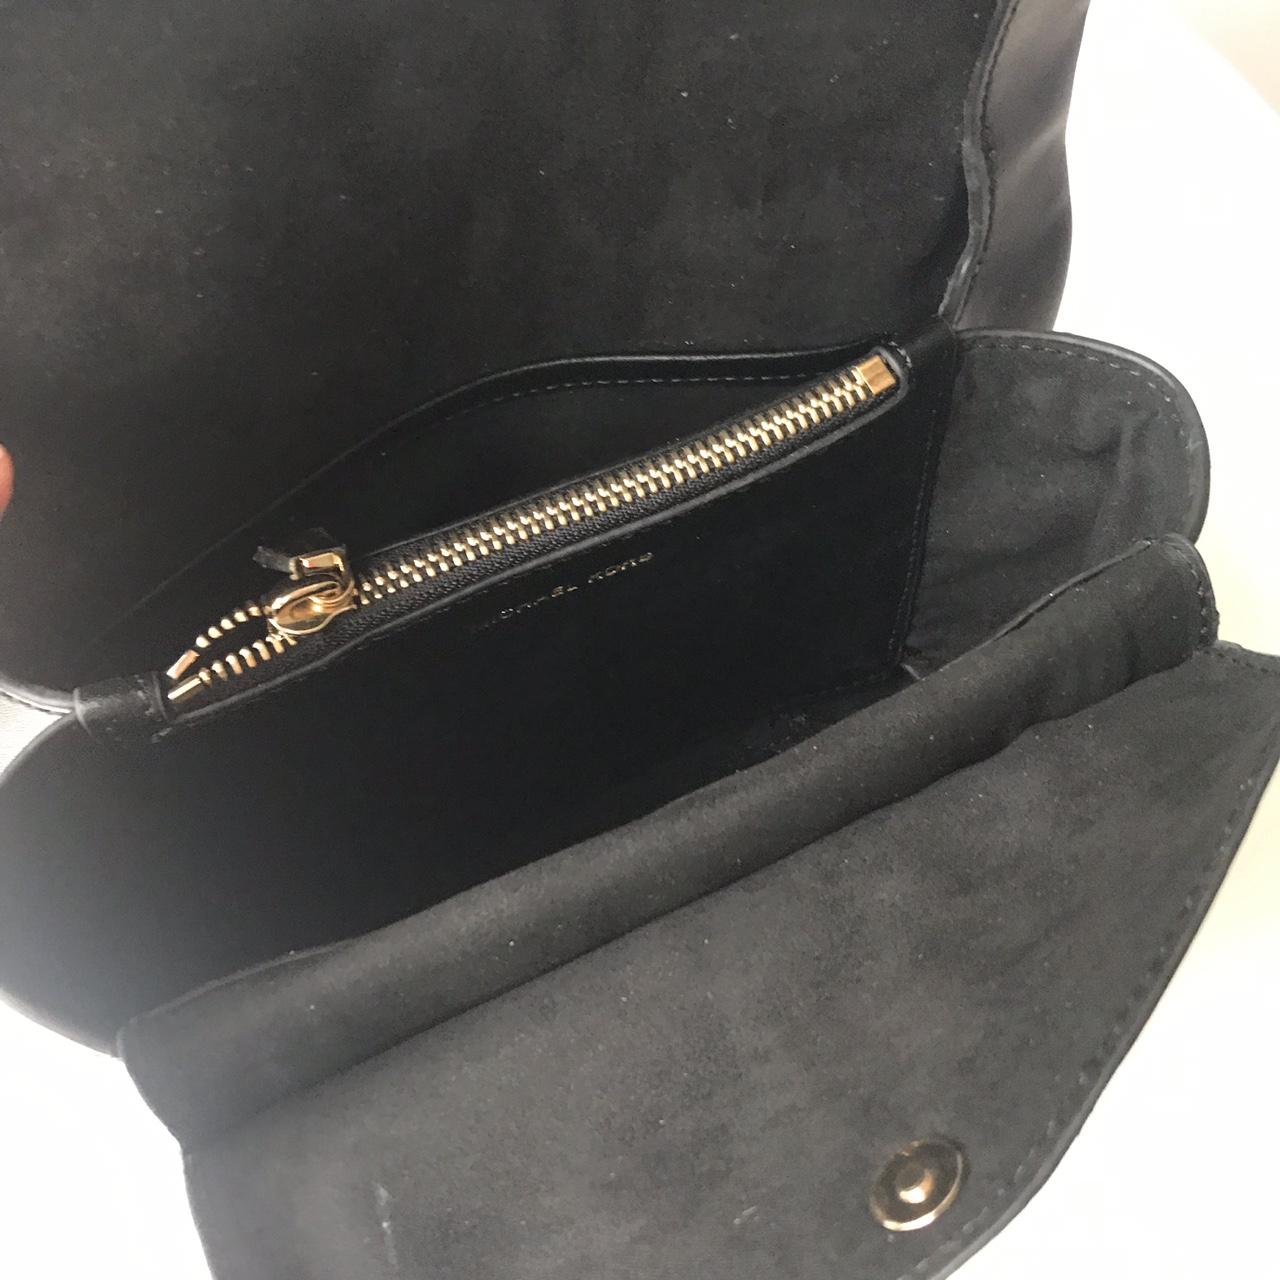 MK包包新款女包 迈克科尔斯原单纳帕牛皮cece链条单肩斜挎包包24CM 黑色